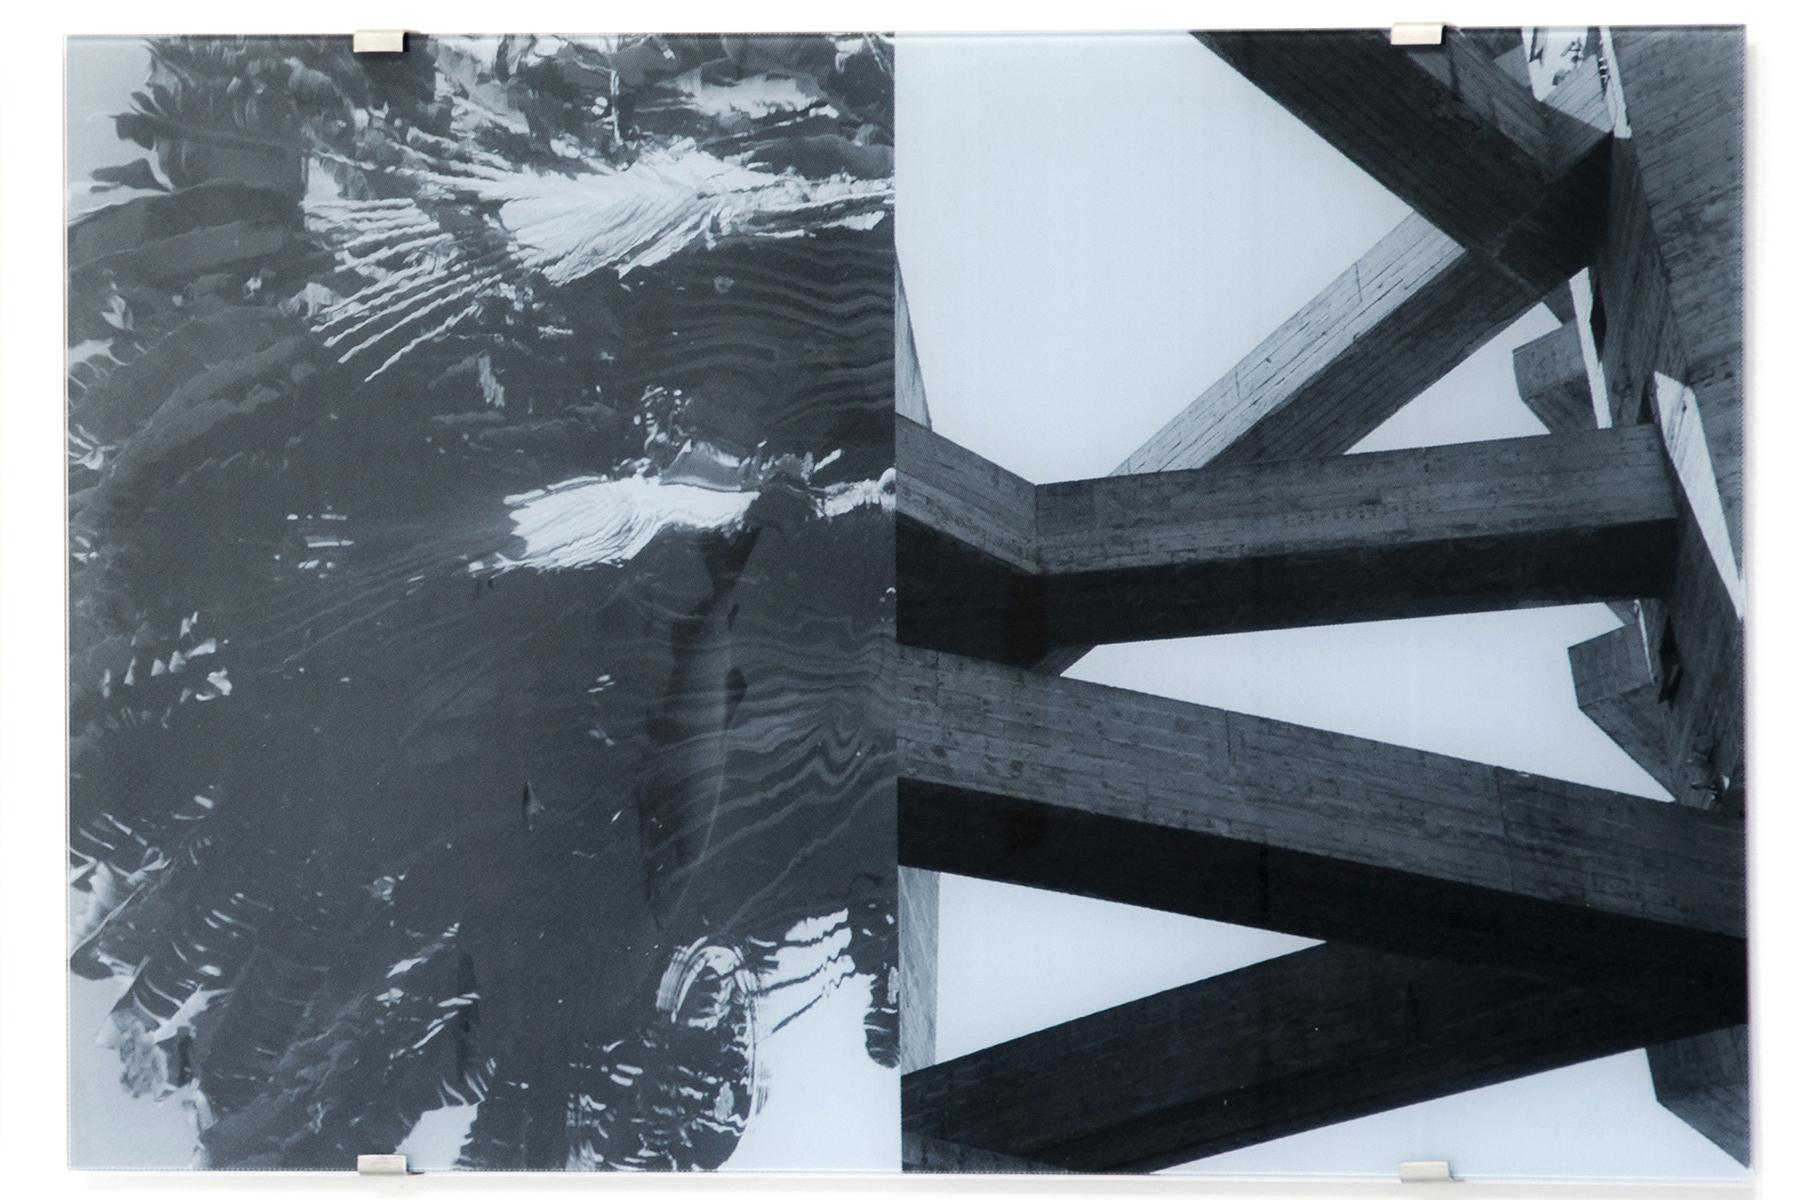 Sesc Pompéia, Musa Troglodytarum, reflection , 2016 silkscreen on glass 27-1/2 x 41-3/8 inches, 70 x 105 cm Edition of 5